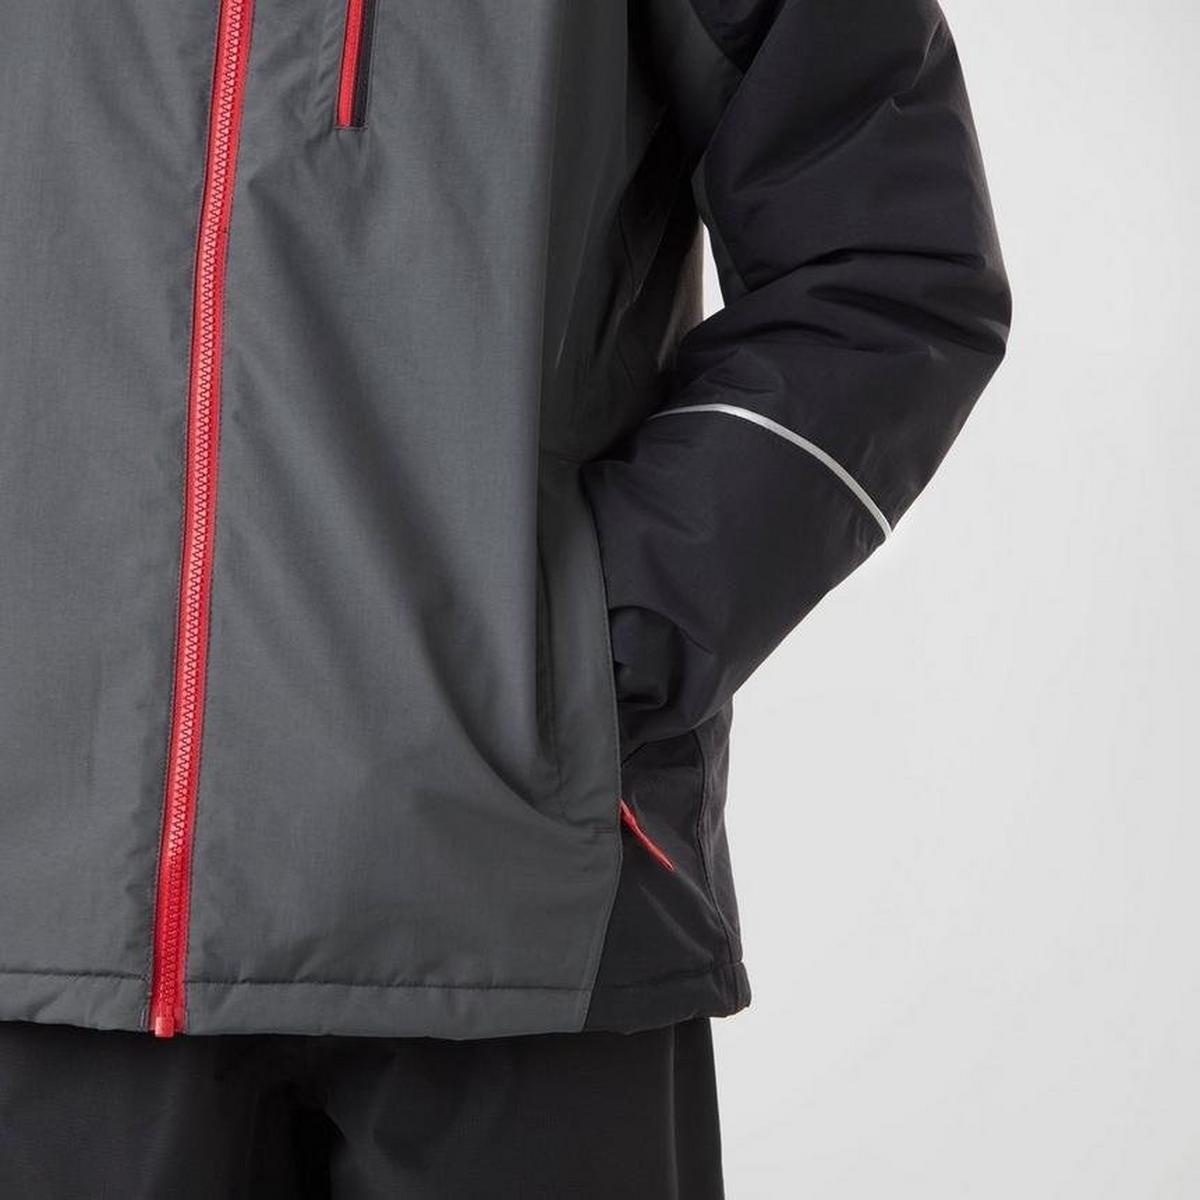 Berghaus Kids' Berghaus Rannoch Jnr Insulated Waterproof Jacket - Black